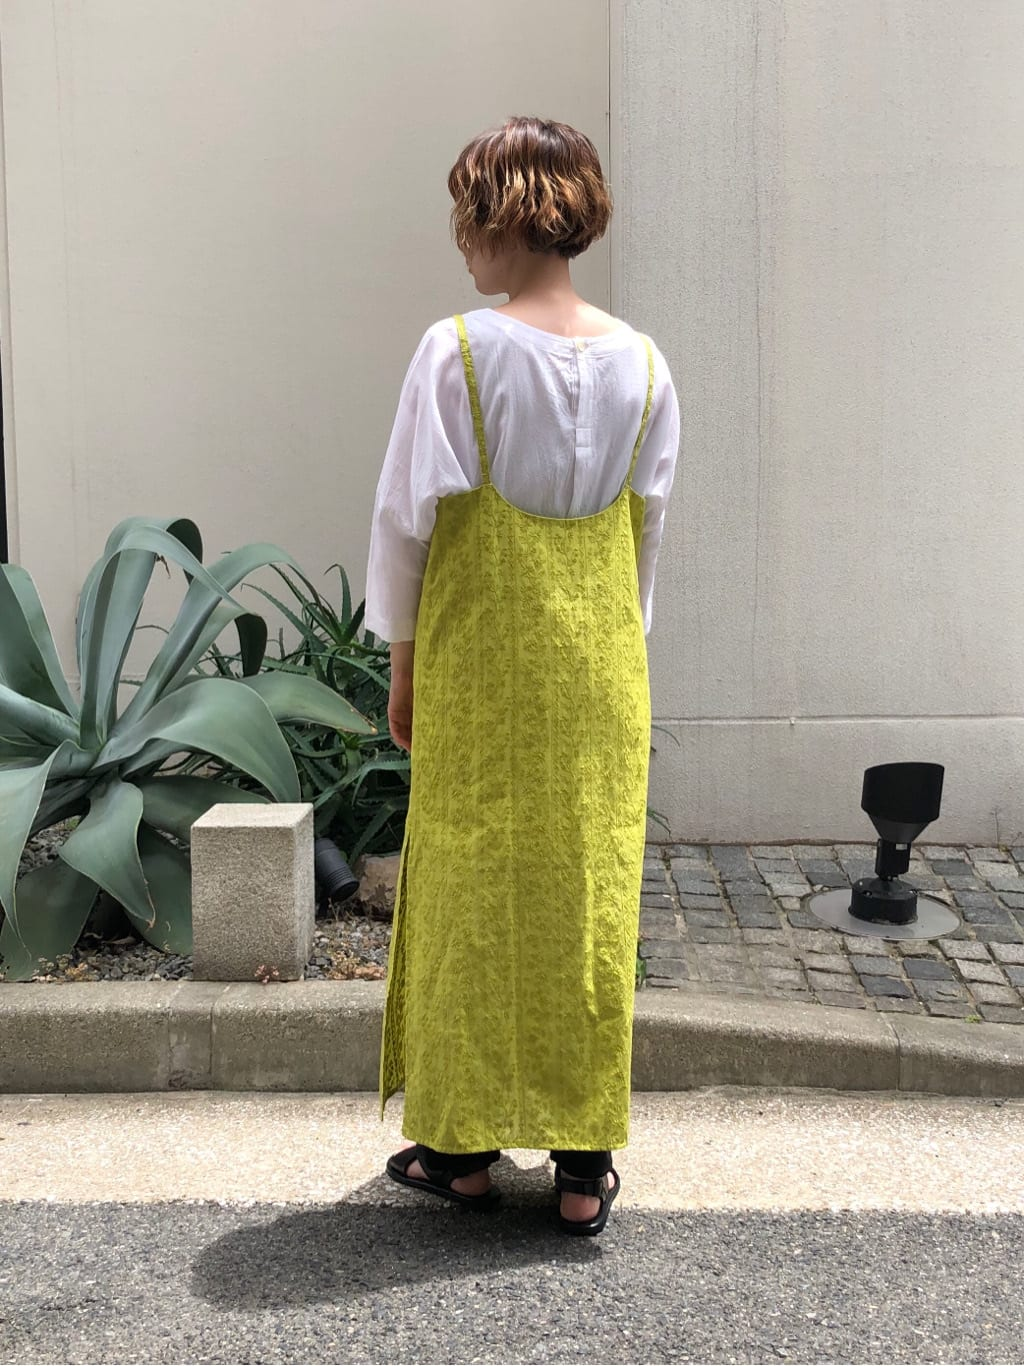 yuni 神戸路面 身長:155cm 2021.06.11